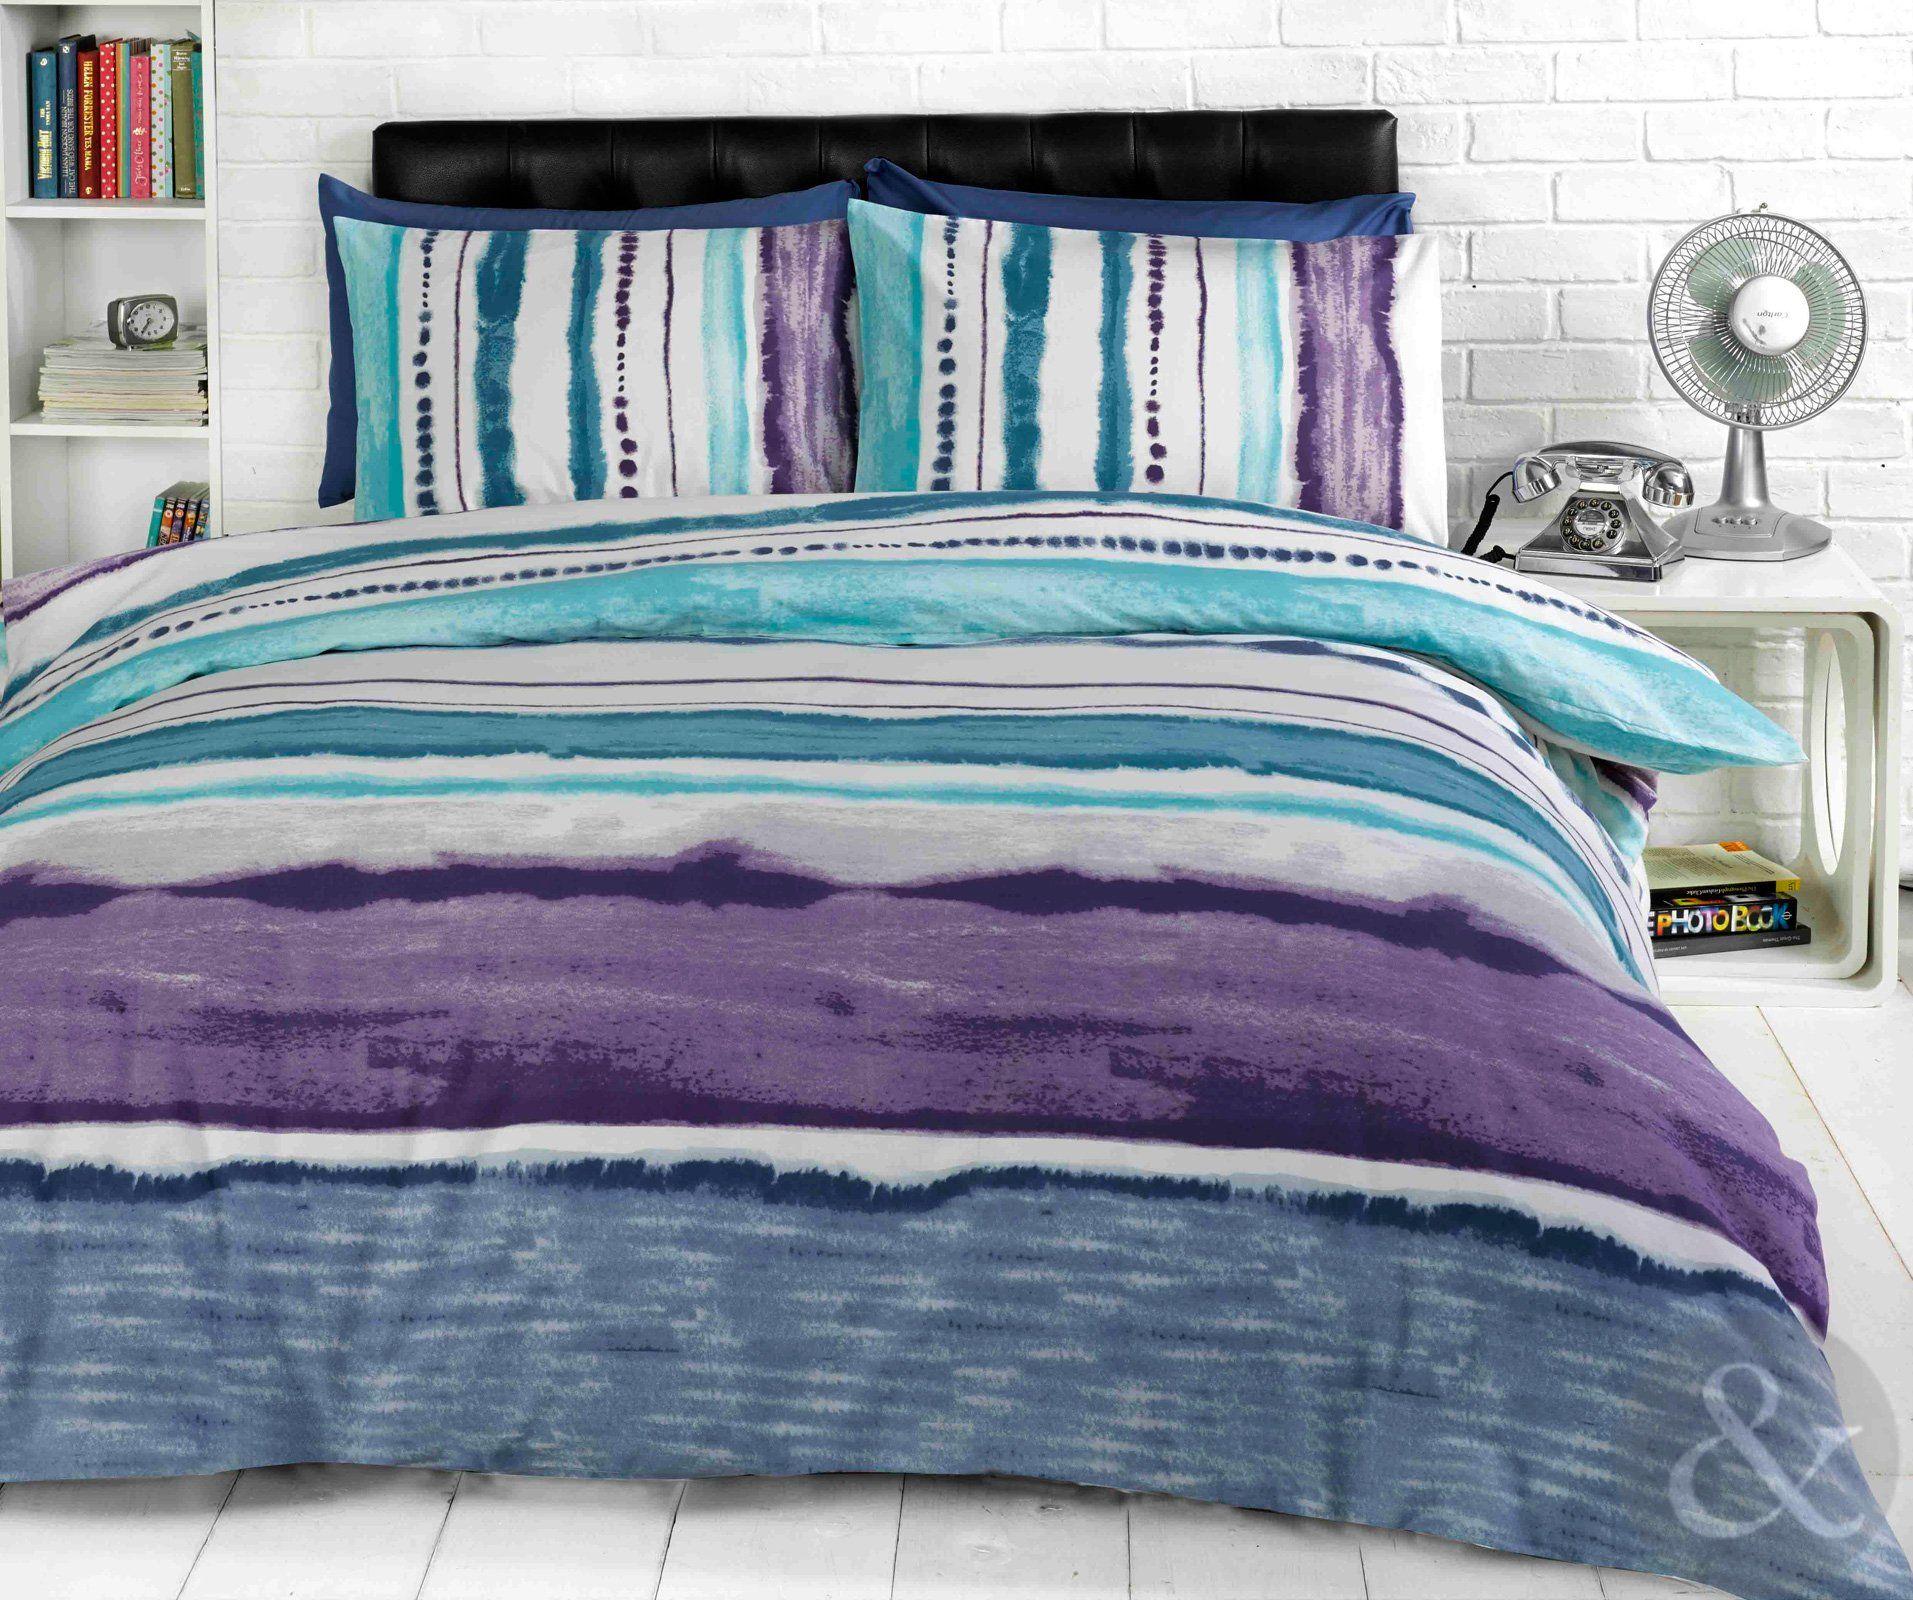 Tye Dye Printed Bedding Contemporary Striped Duvet Cover